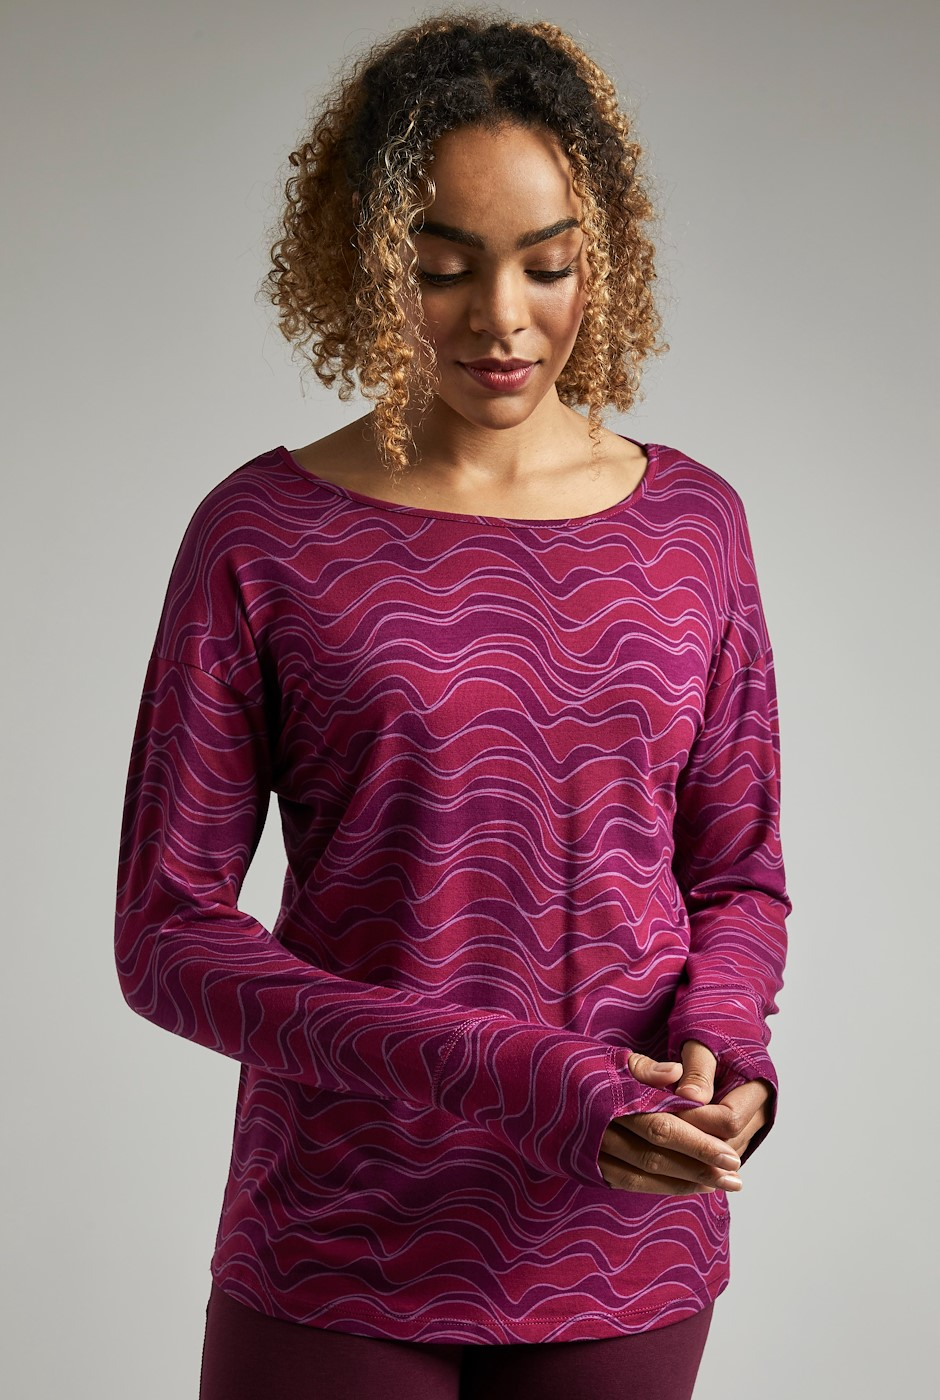 Hestia Bamboo Printed T-Shirt Cranberry